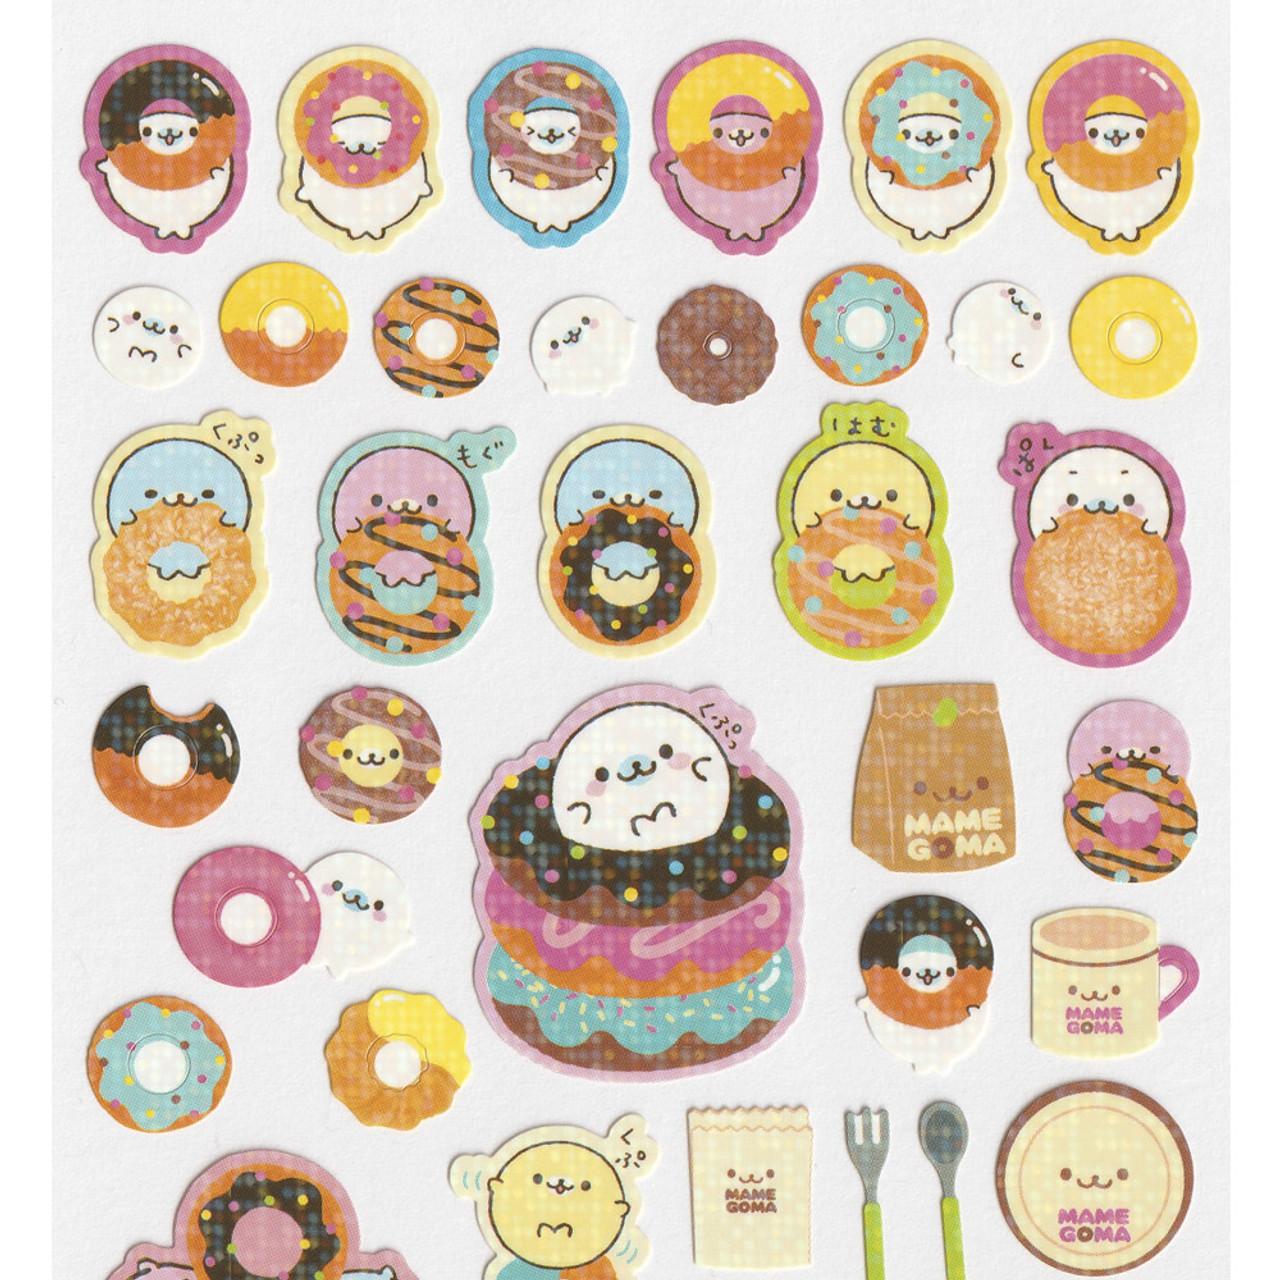 Mamegoma Sea Lion Glitters Sticker SE07102 ( Top Part )